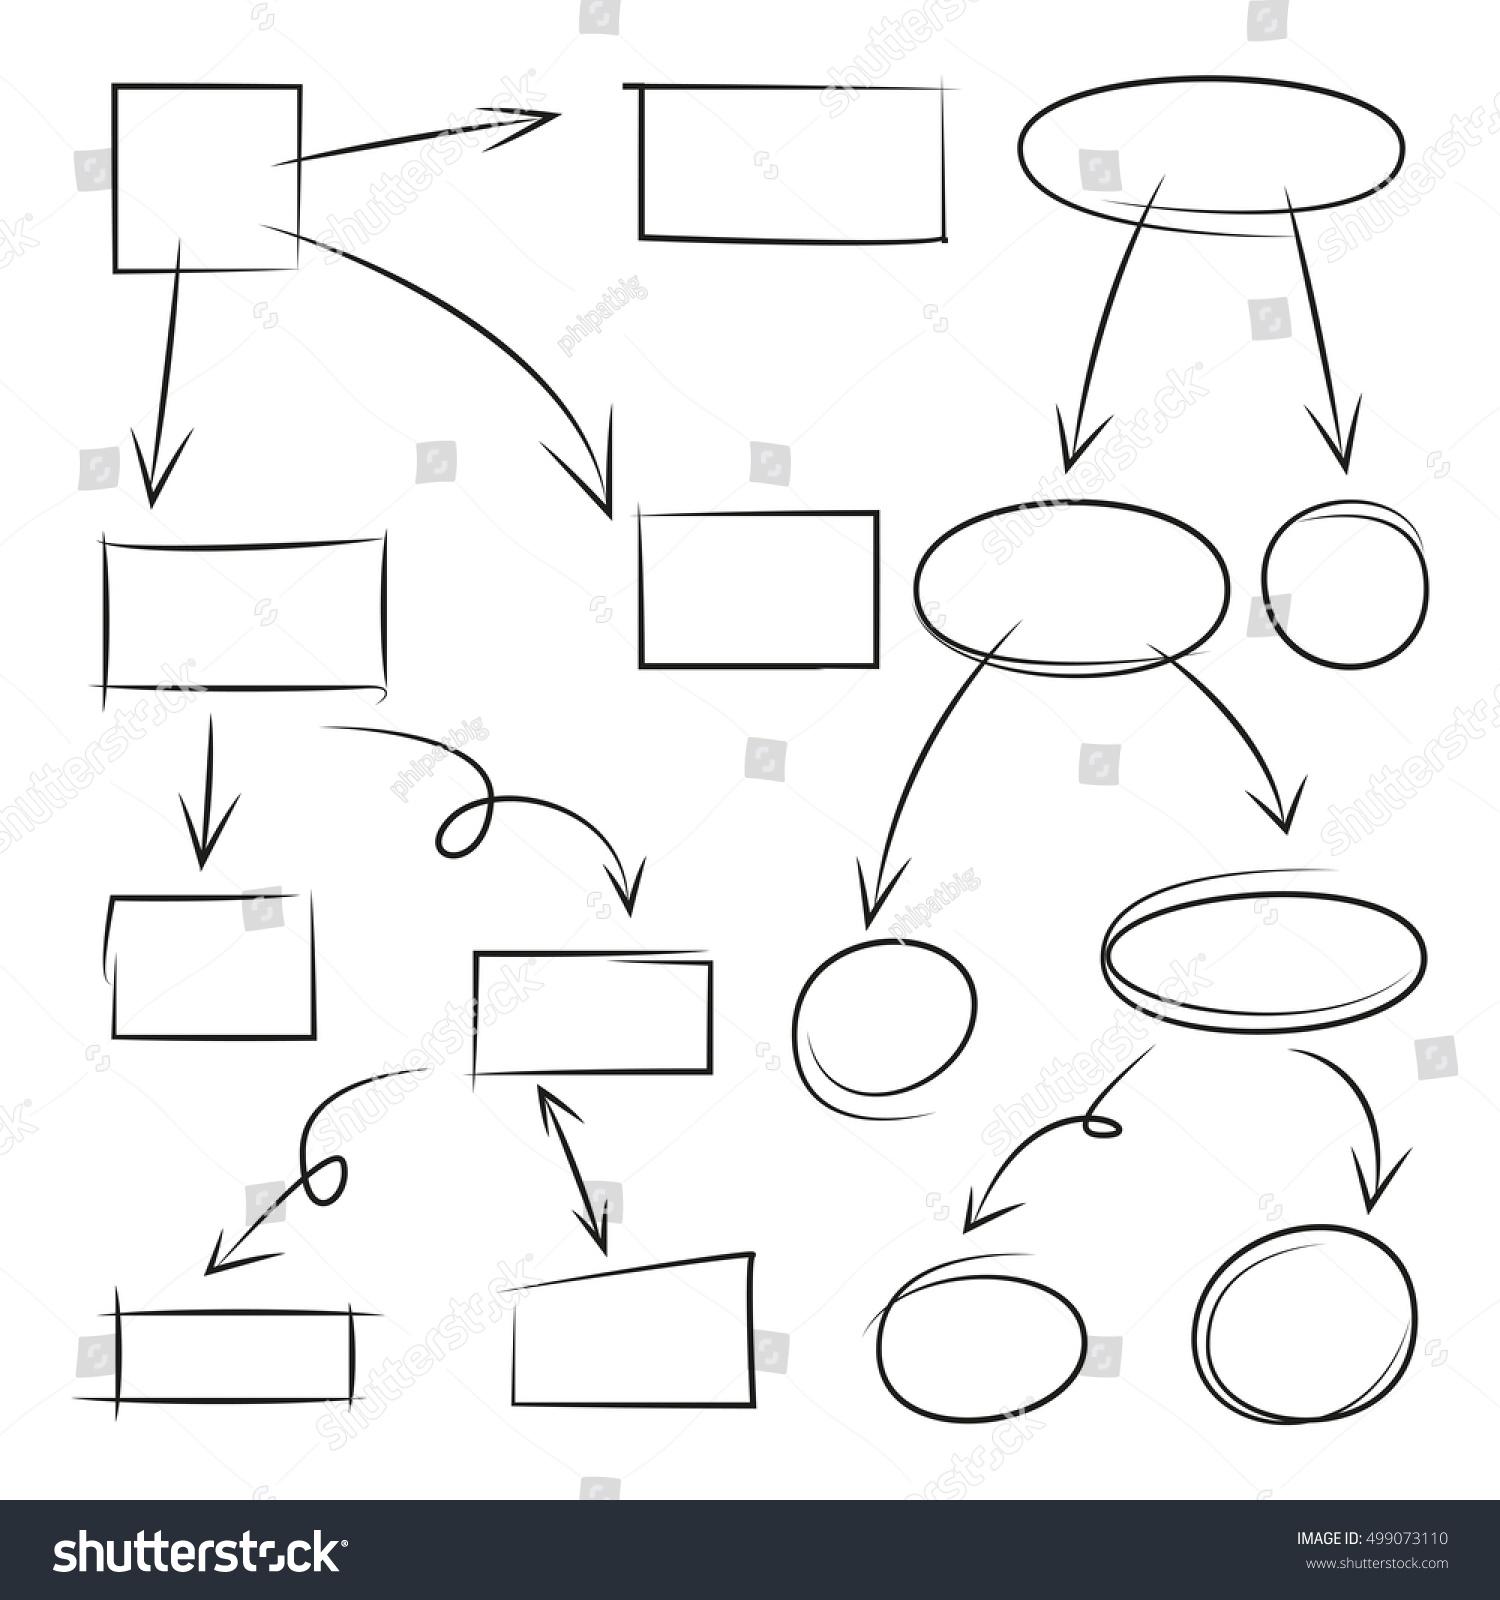 Hand drawn arrows circle rectangle flowchart stock vector hand drawn arrows circle and rectangle for flowchart diagram nvjuhfo Gallery